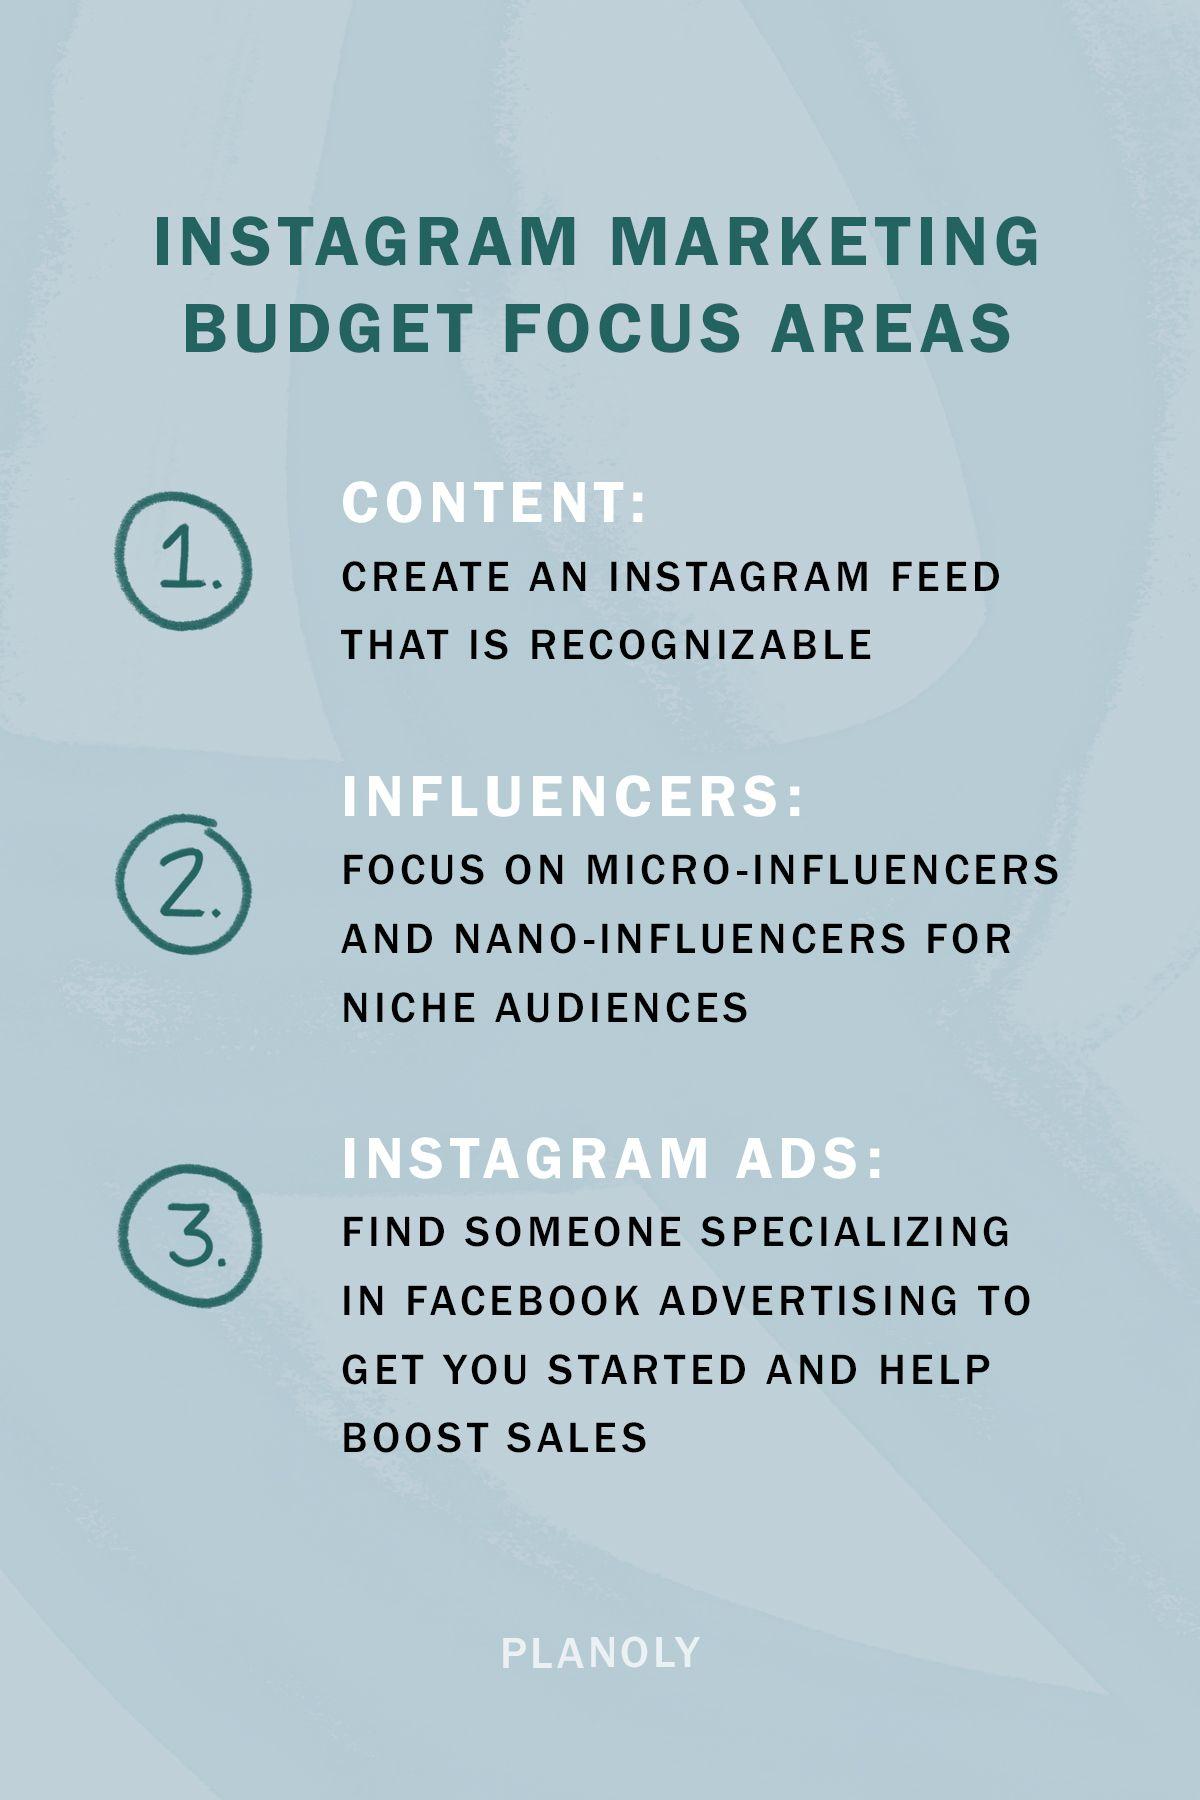 PLANOLY-Blog Post-Social Media Strategy-Image 2